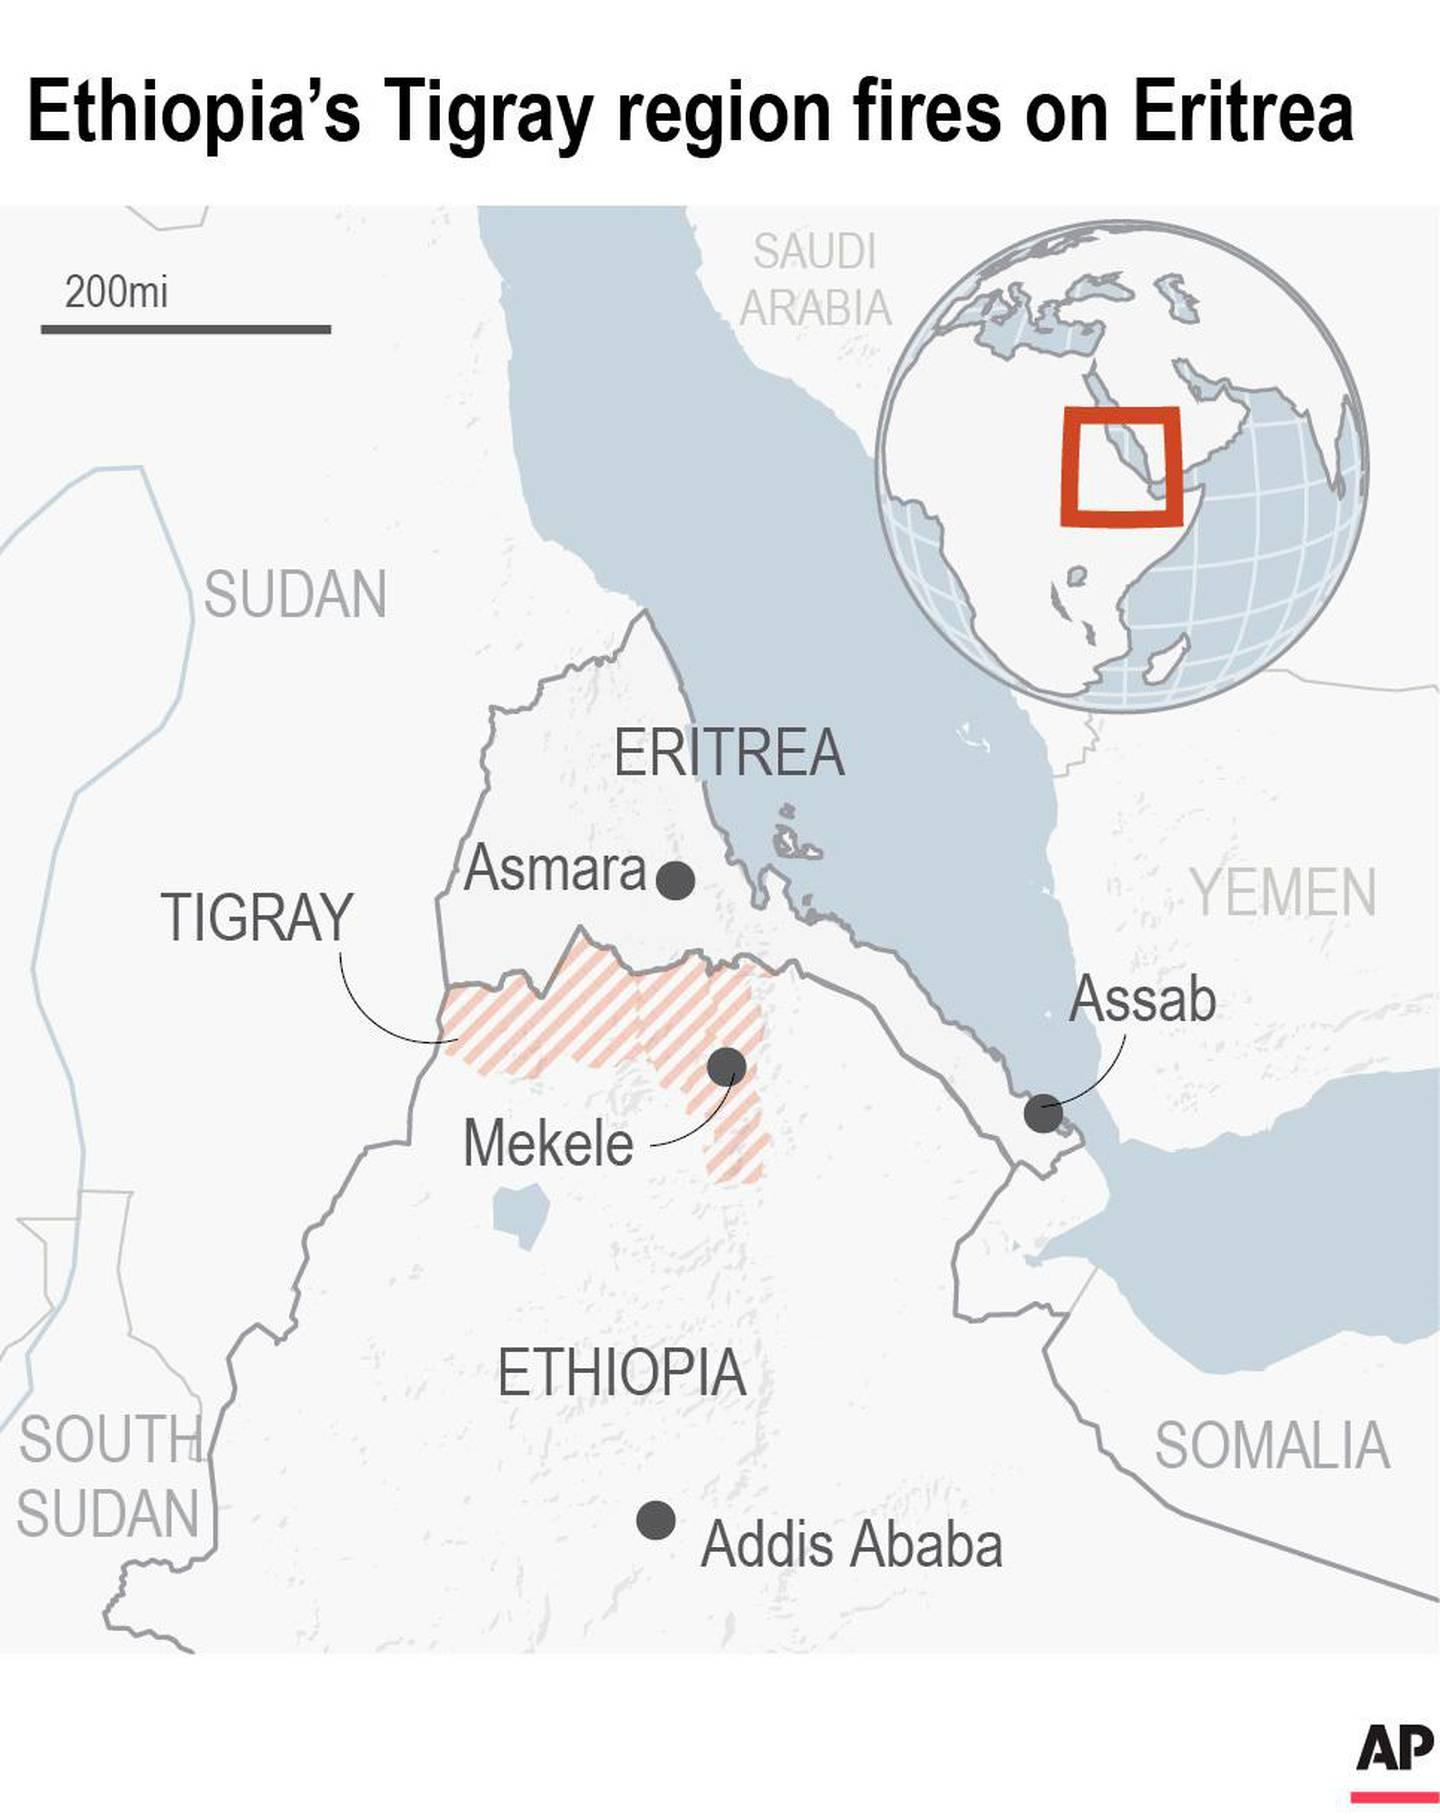 Map locates Eritrea and the Tigray region of Ethiopia